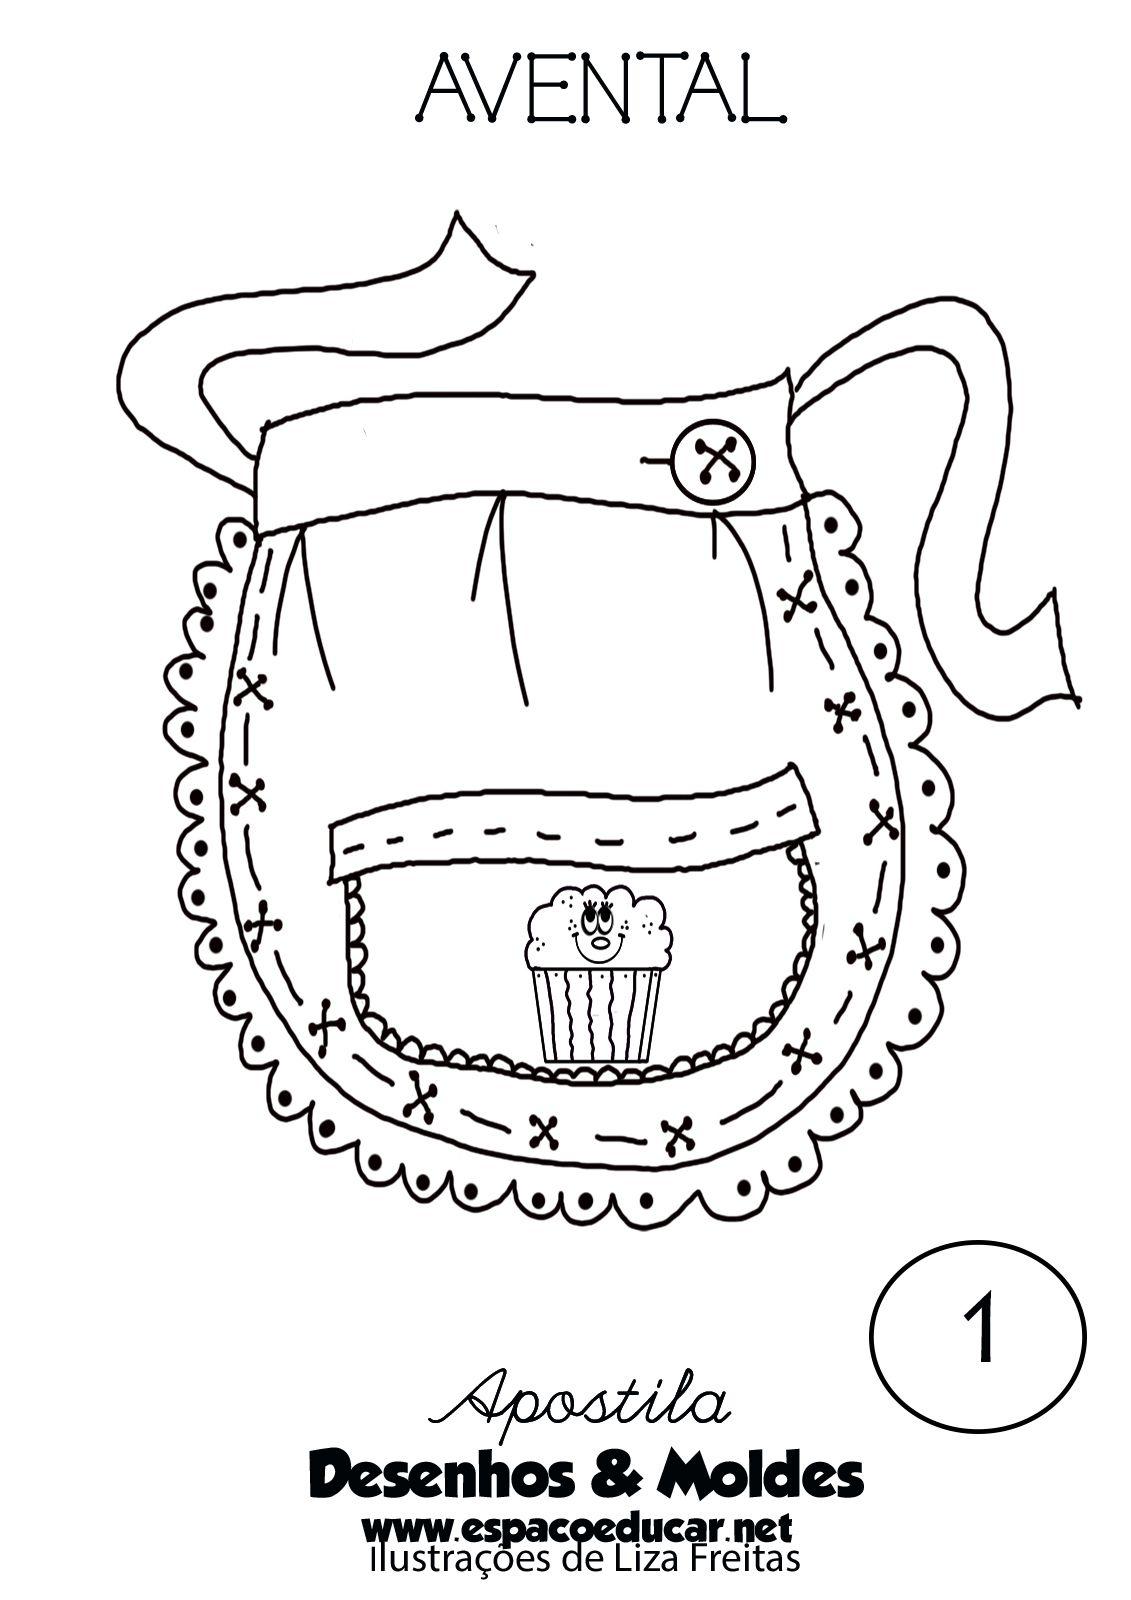 Desenho De Avental Para Colorir Pintar Imprimir Espaco Educar